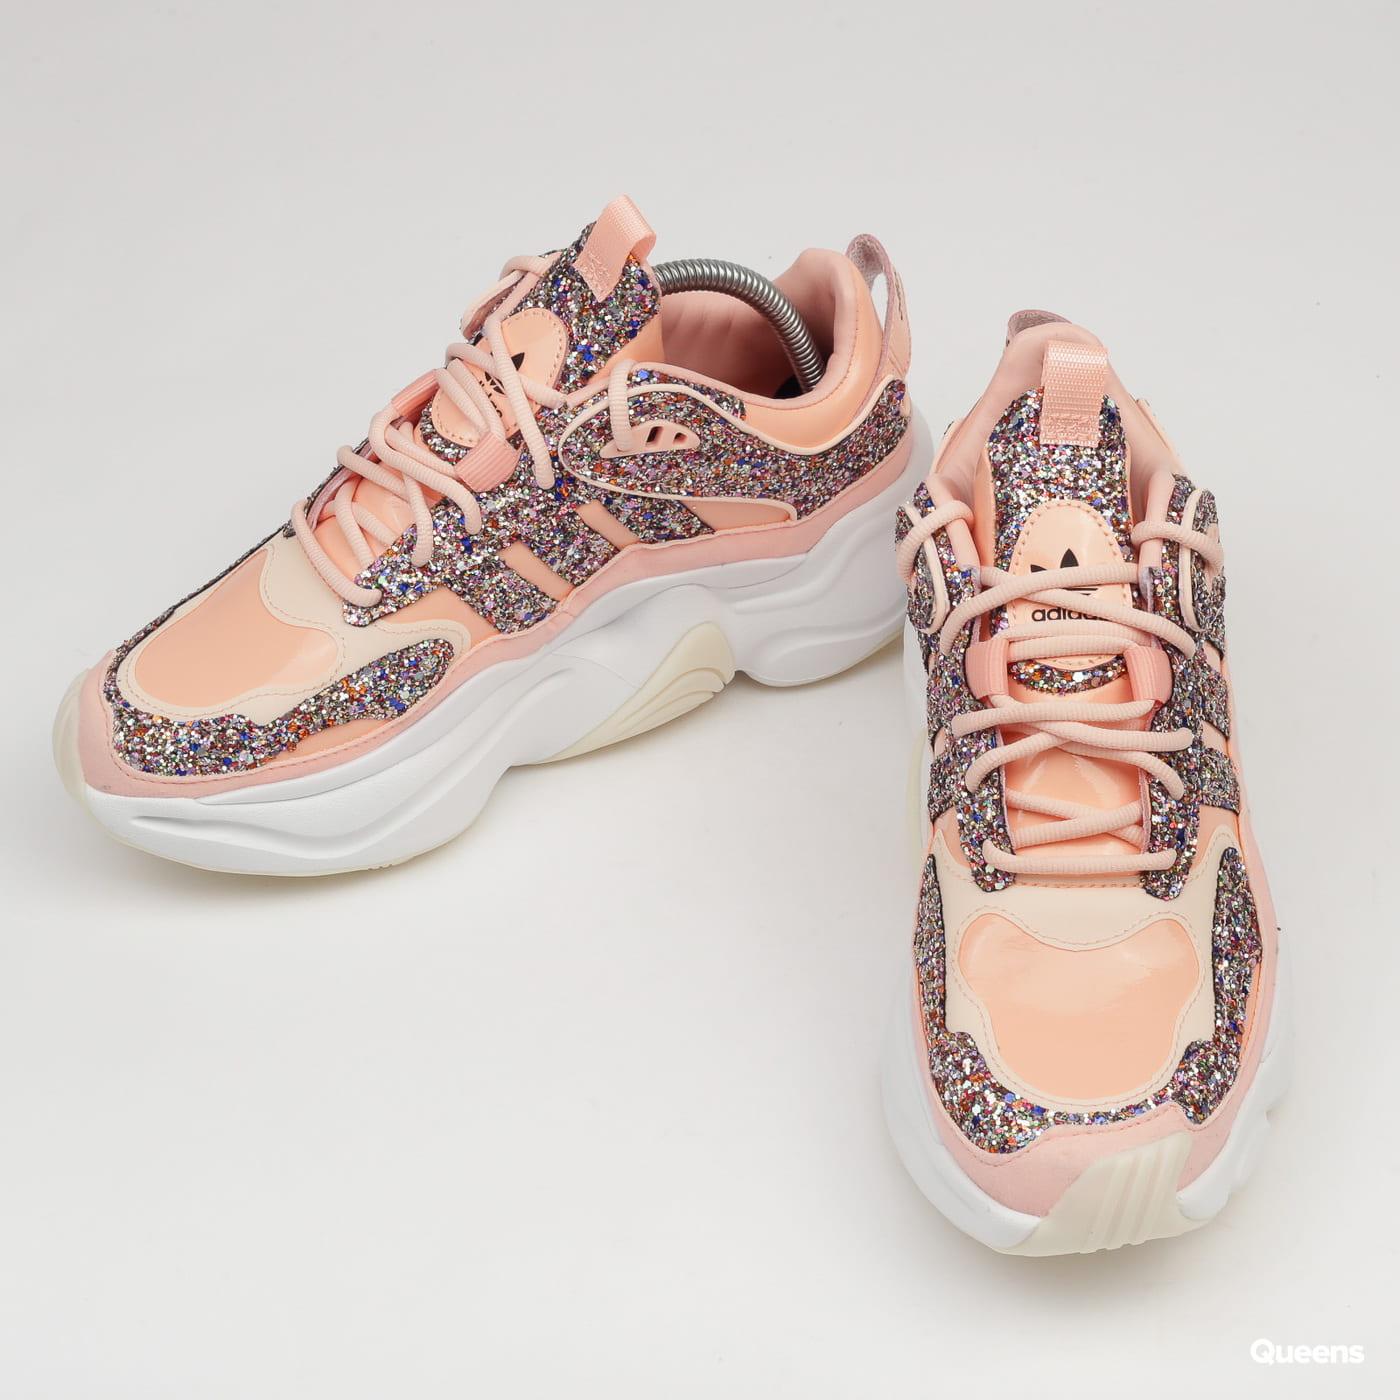 adidas Originals Magmur Runner W glopnk / glopnk / glopnk